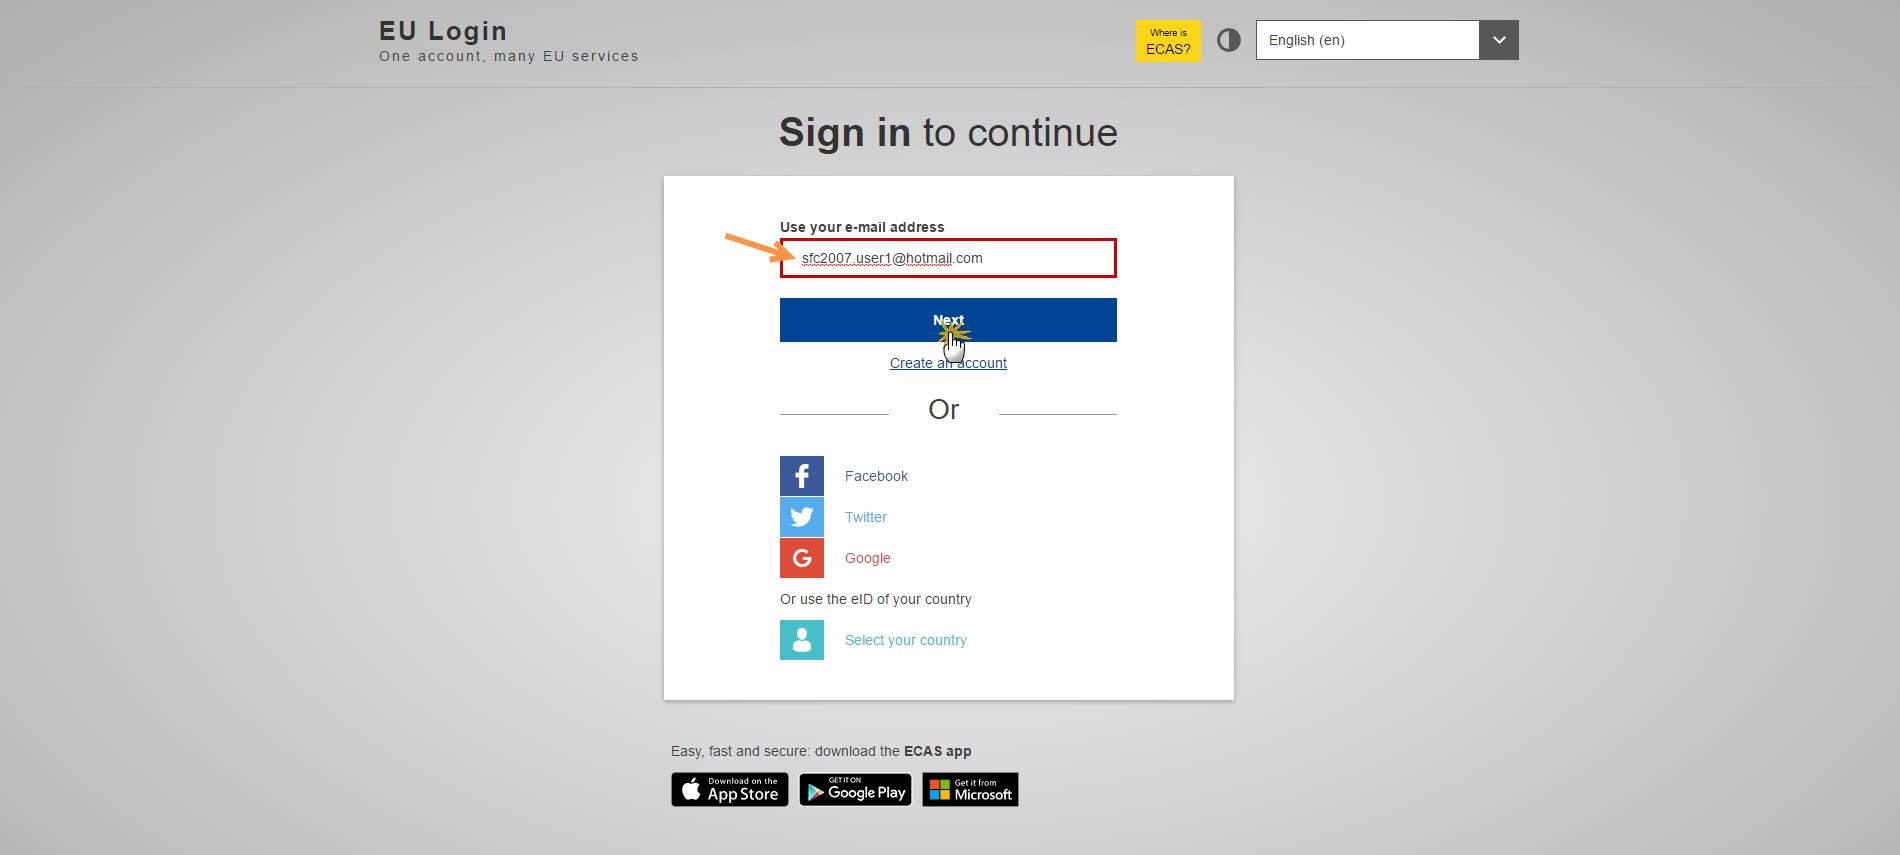 How do i change my facebook login email address